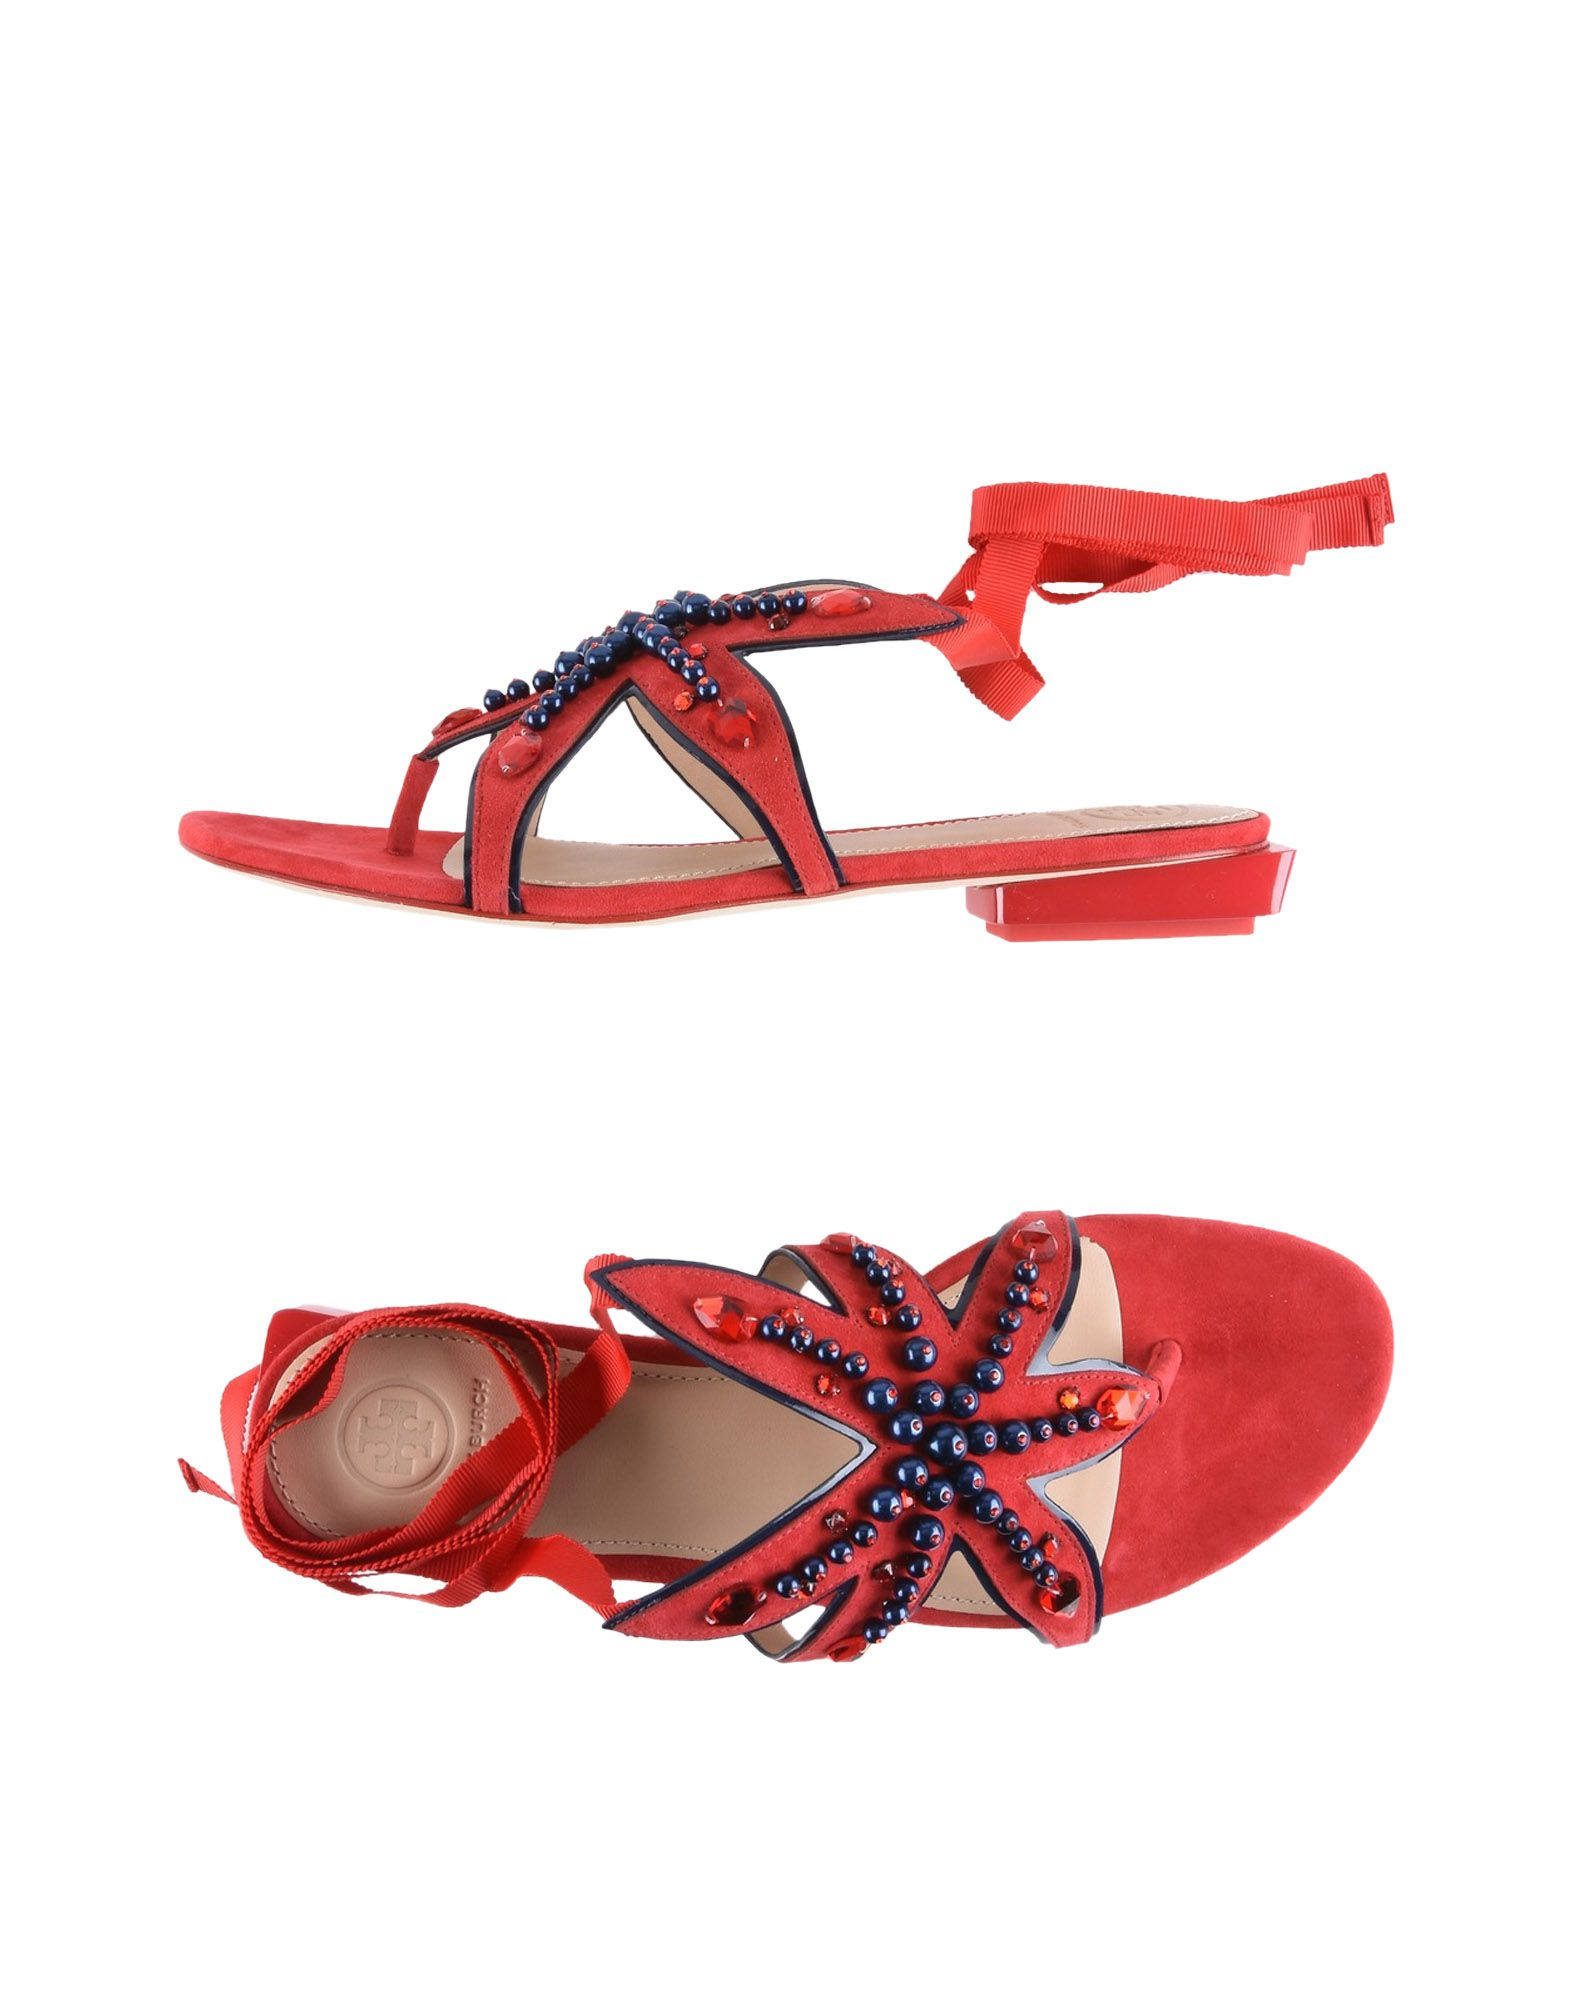 Tory Burch Dianetten Damen  11425442OMGut aussehende strapazierfähige Schuhe